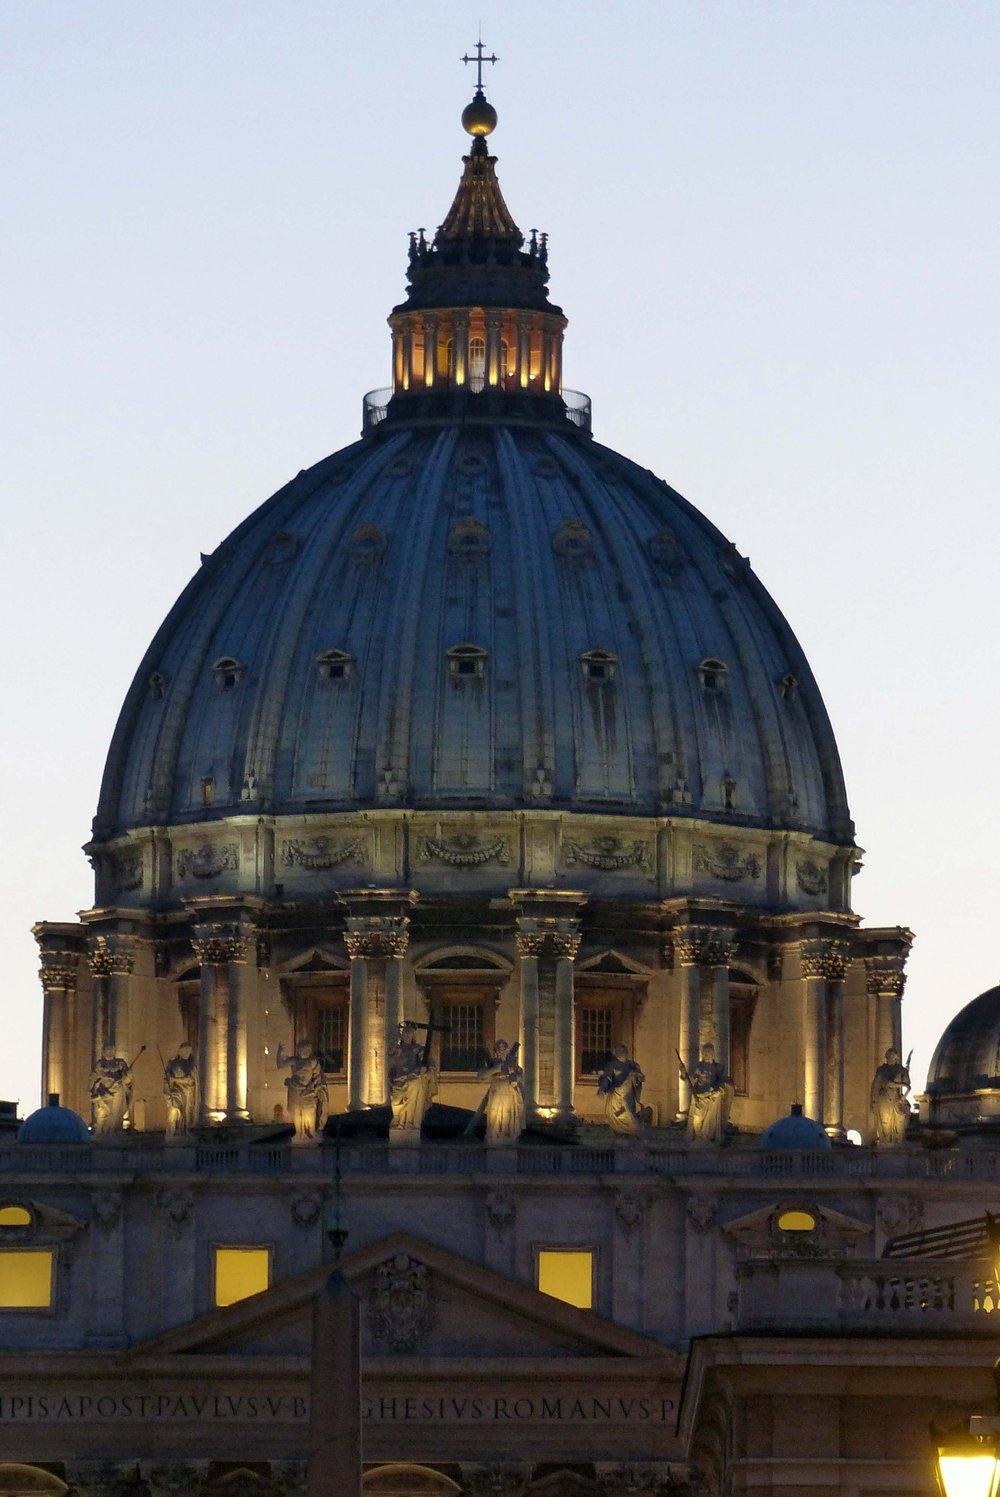 Best of Italy 2013 191-2672x4000.jpg